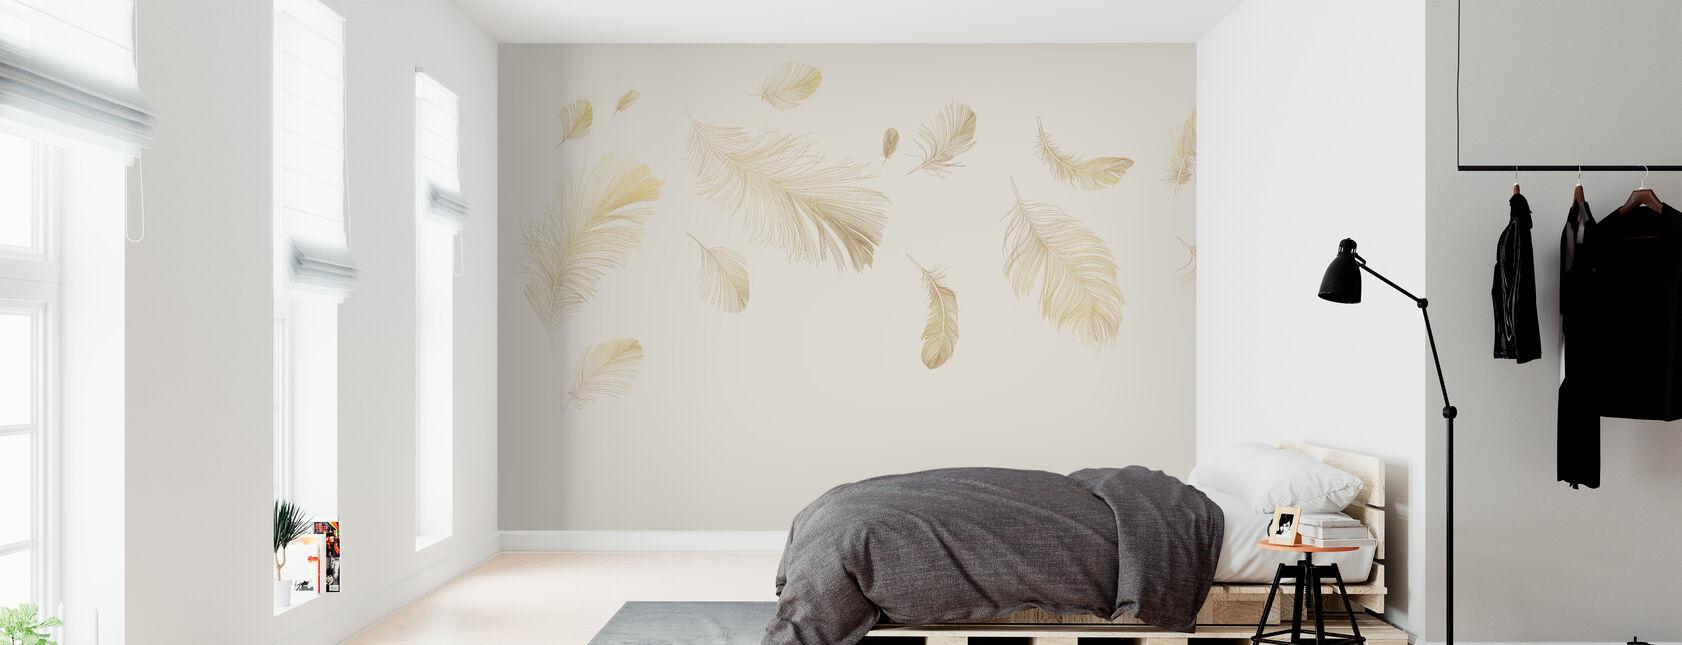 Flying Feathers - Soft Beige - Wallpaper - Bedroom